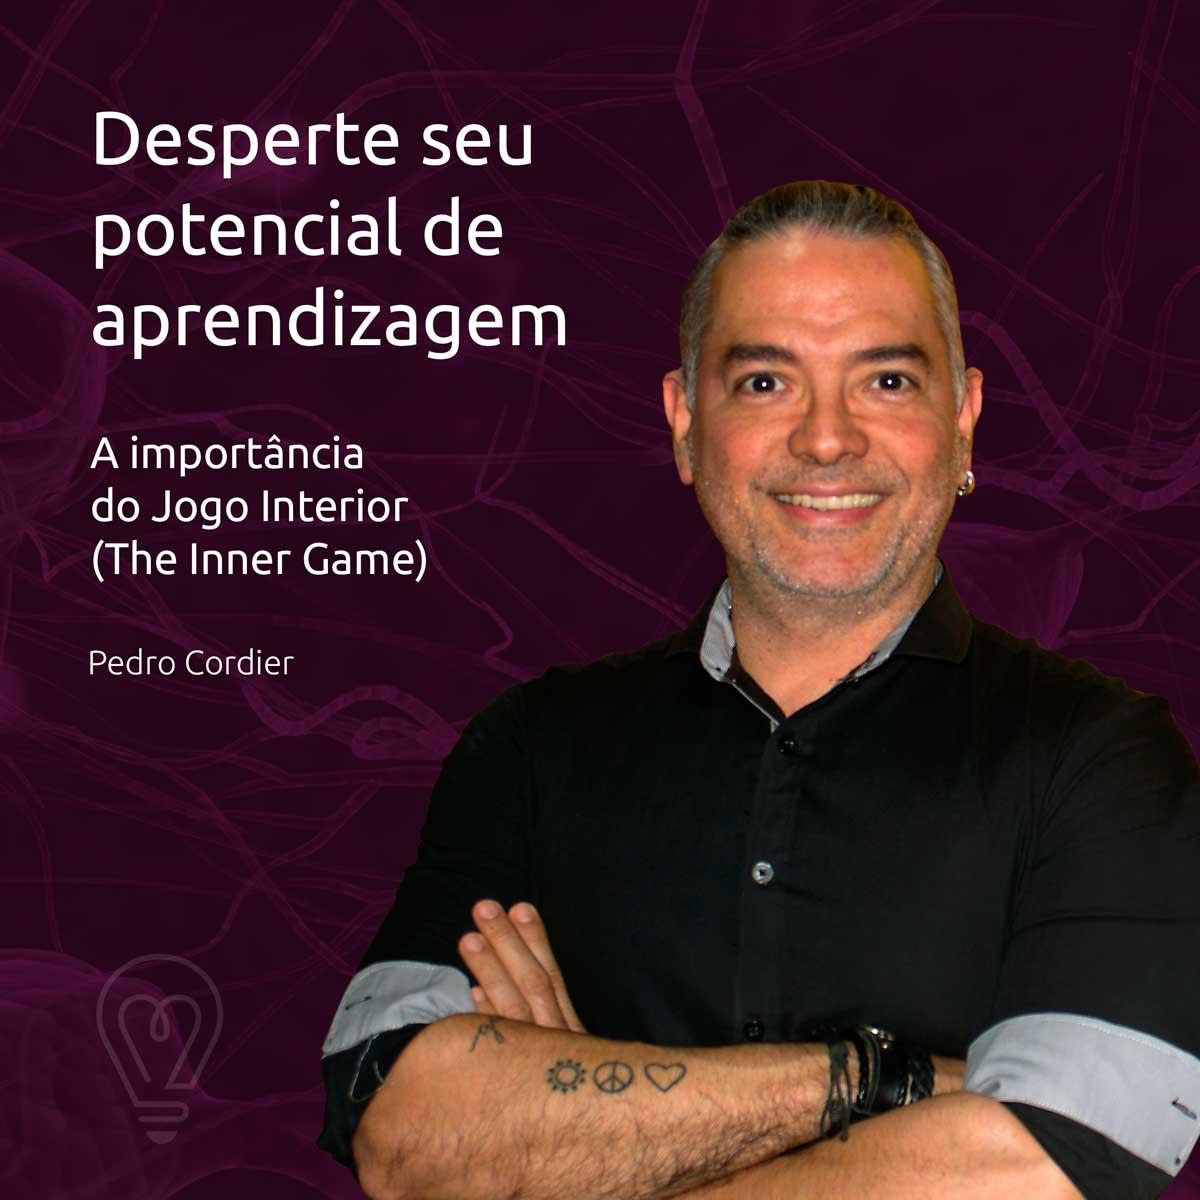 meta-inteligencia-emocional-pedro-cordier-coach-the-inner-game-coaching-002